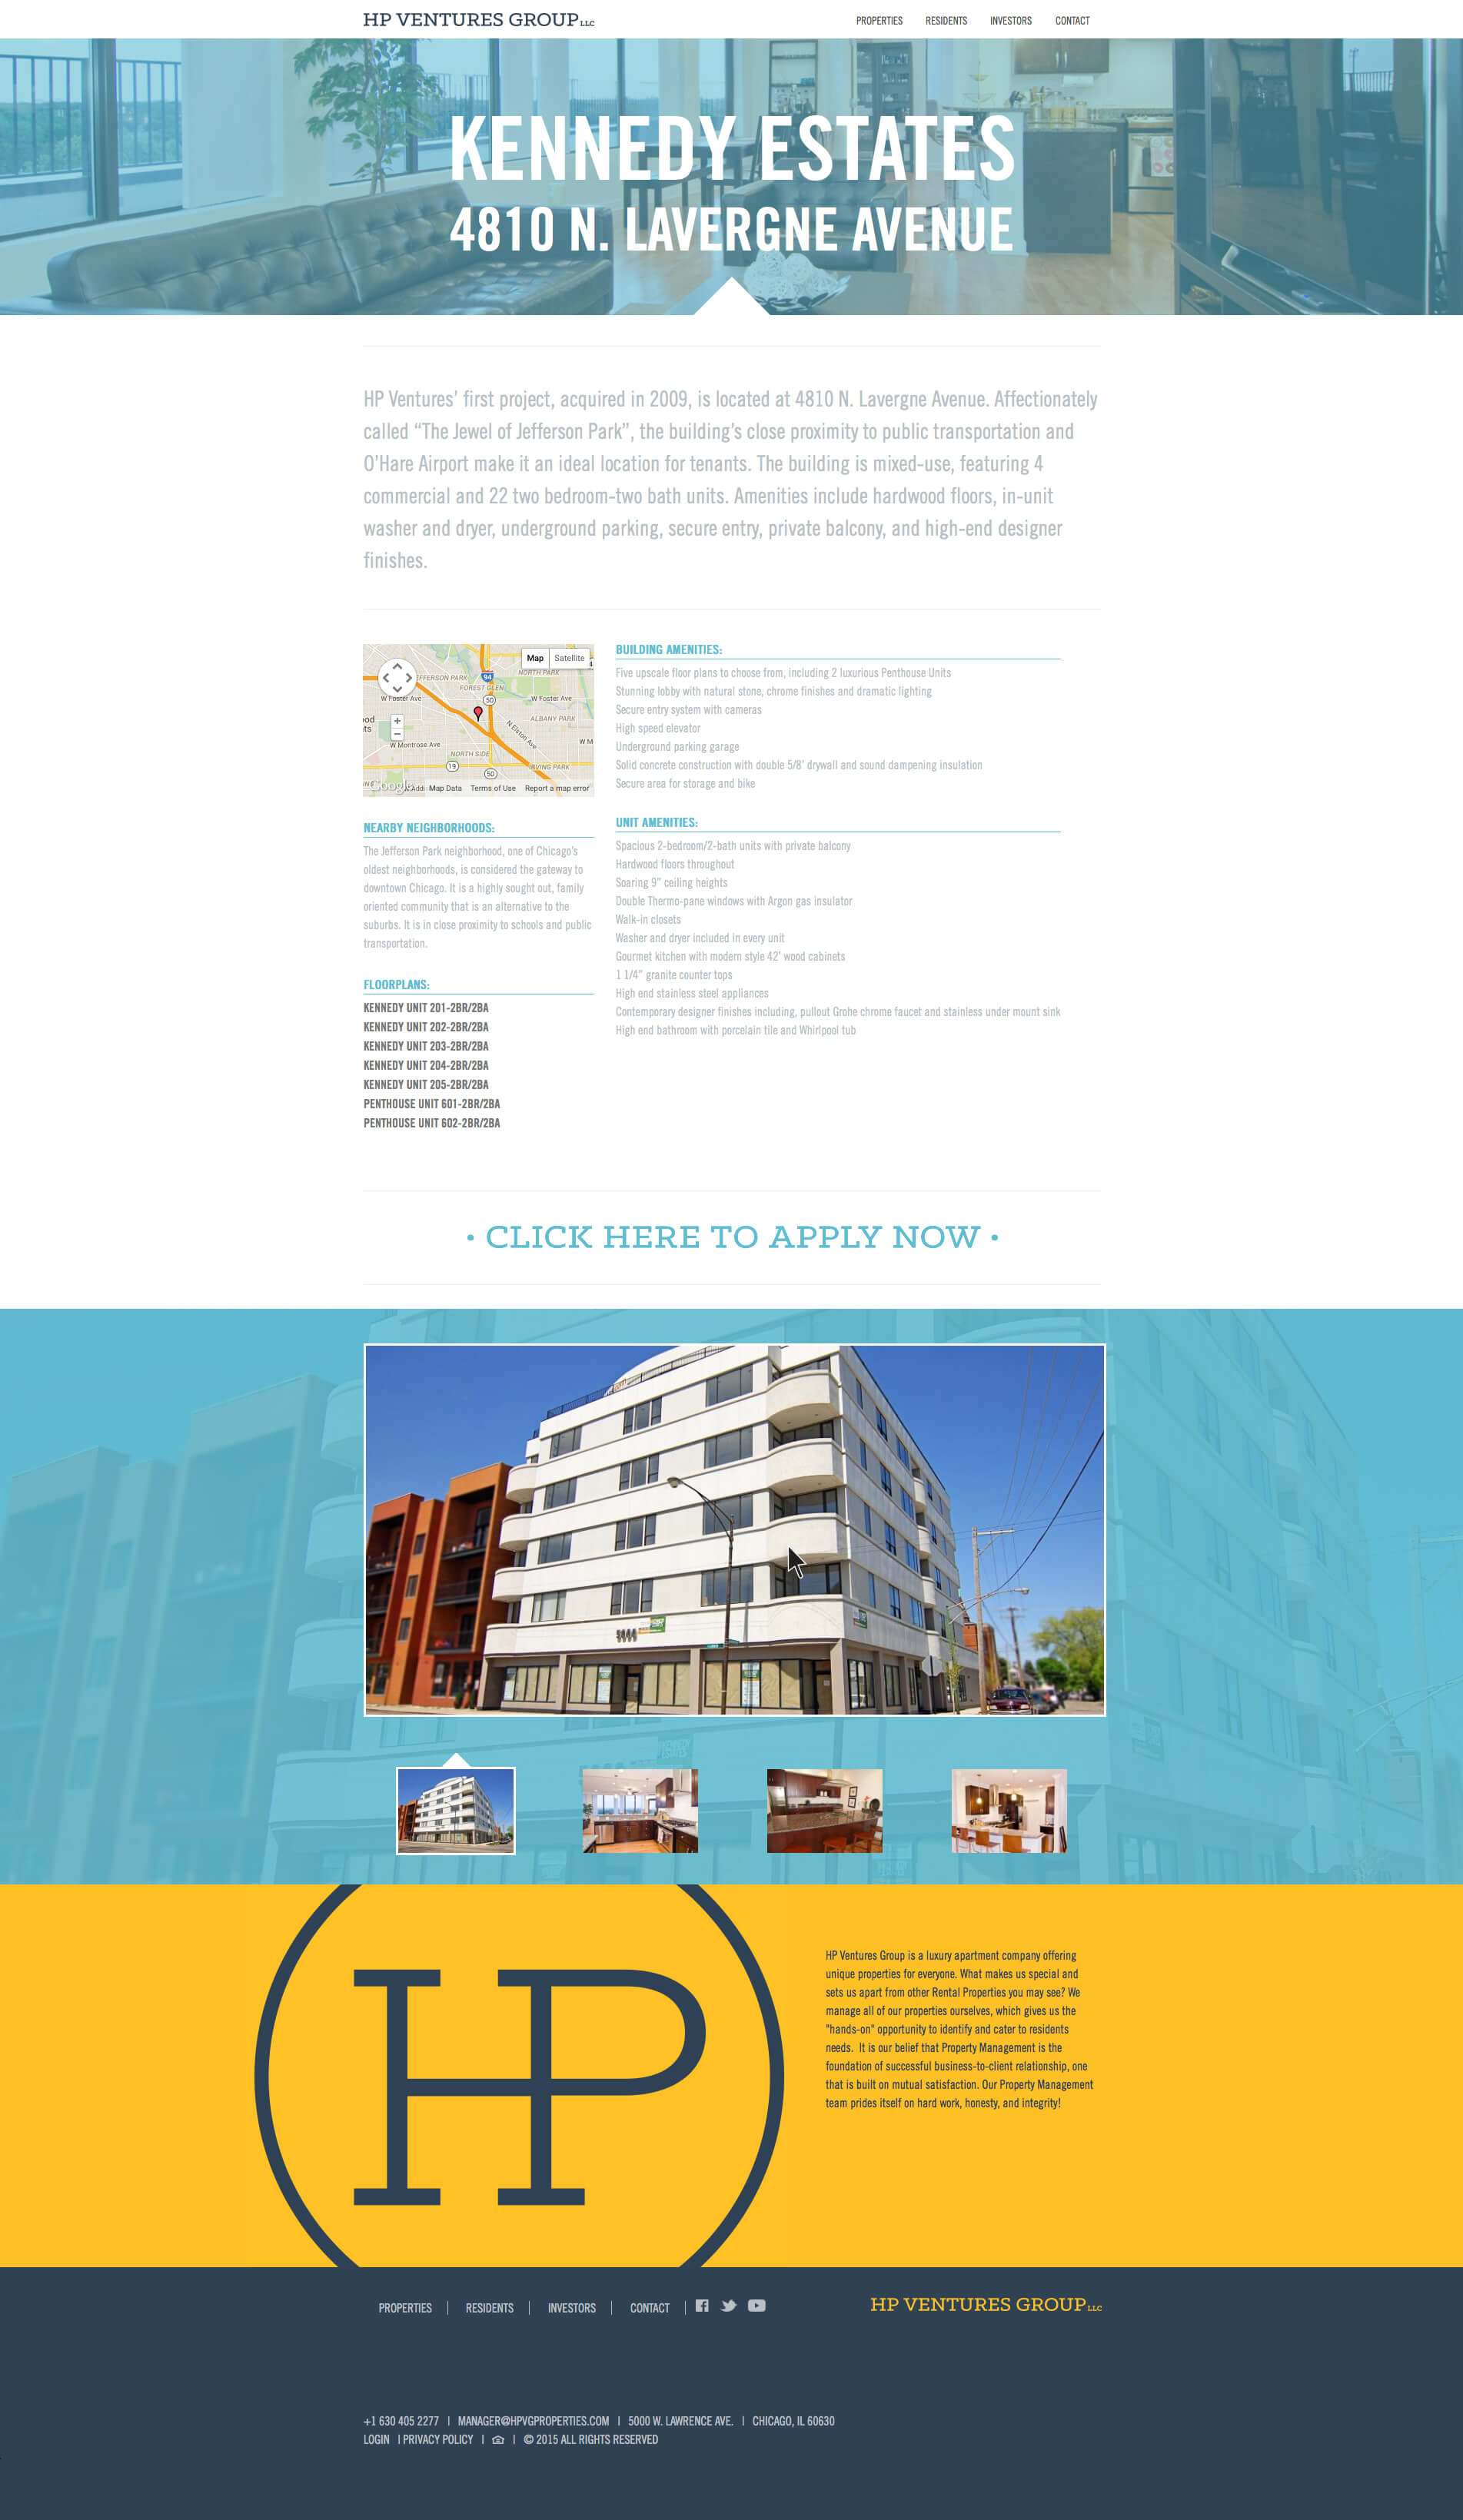 HP Ventures Group - Luxury Apartment Rentals - Chicago, Illinois - Website Design